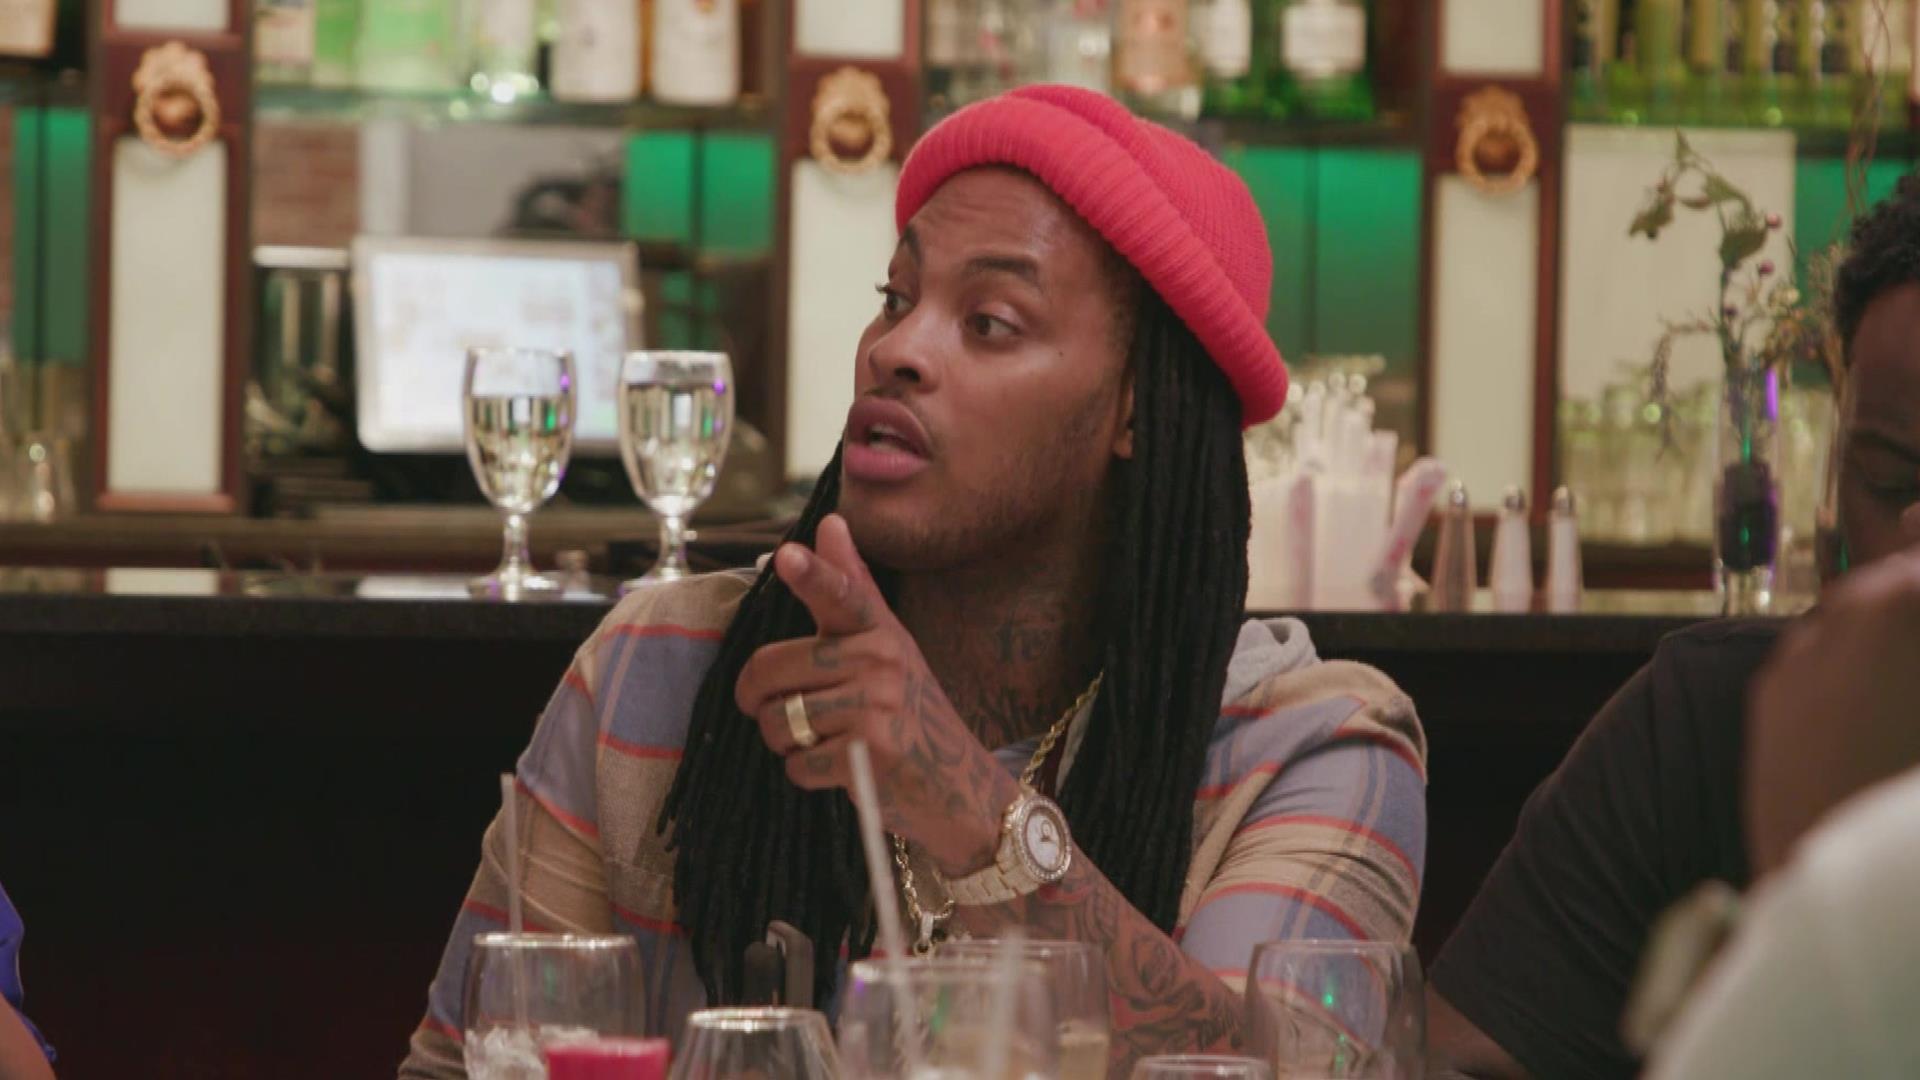 Growing Up Hip Hop: Atlanta – Growing Up Hip Hop: Atlanta Season 3